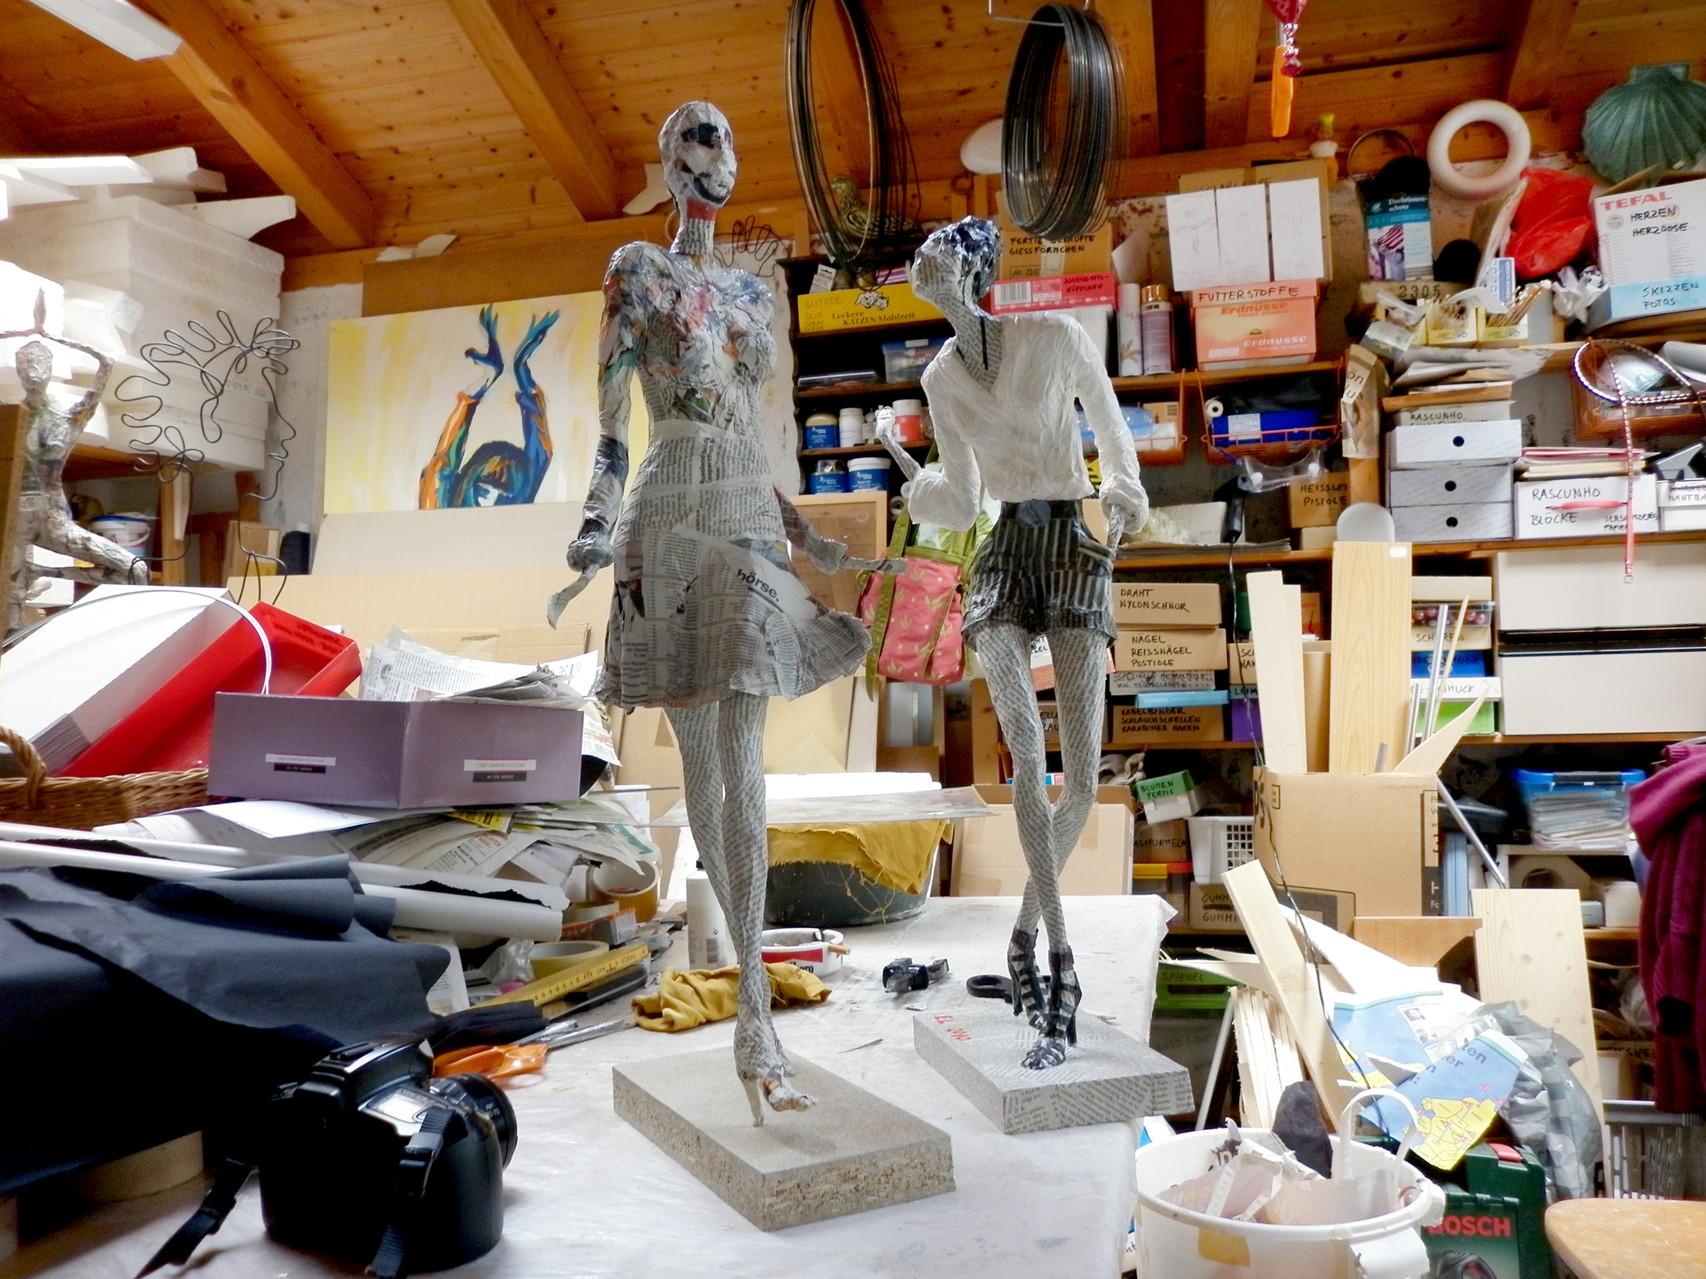 Elena Lichtsteiner, Skulpturen: Atelierimpressionen